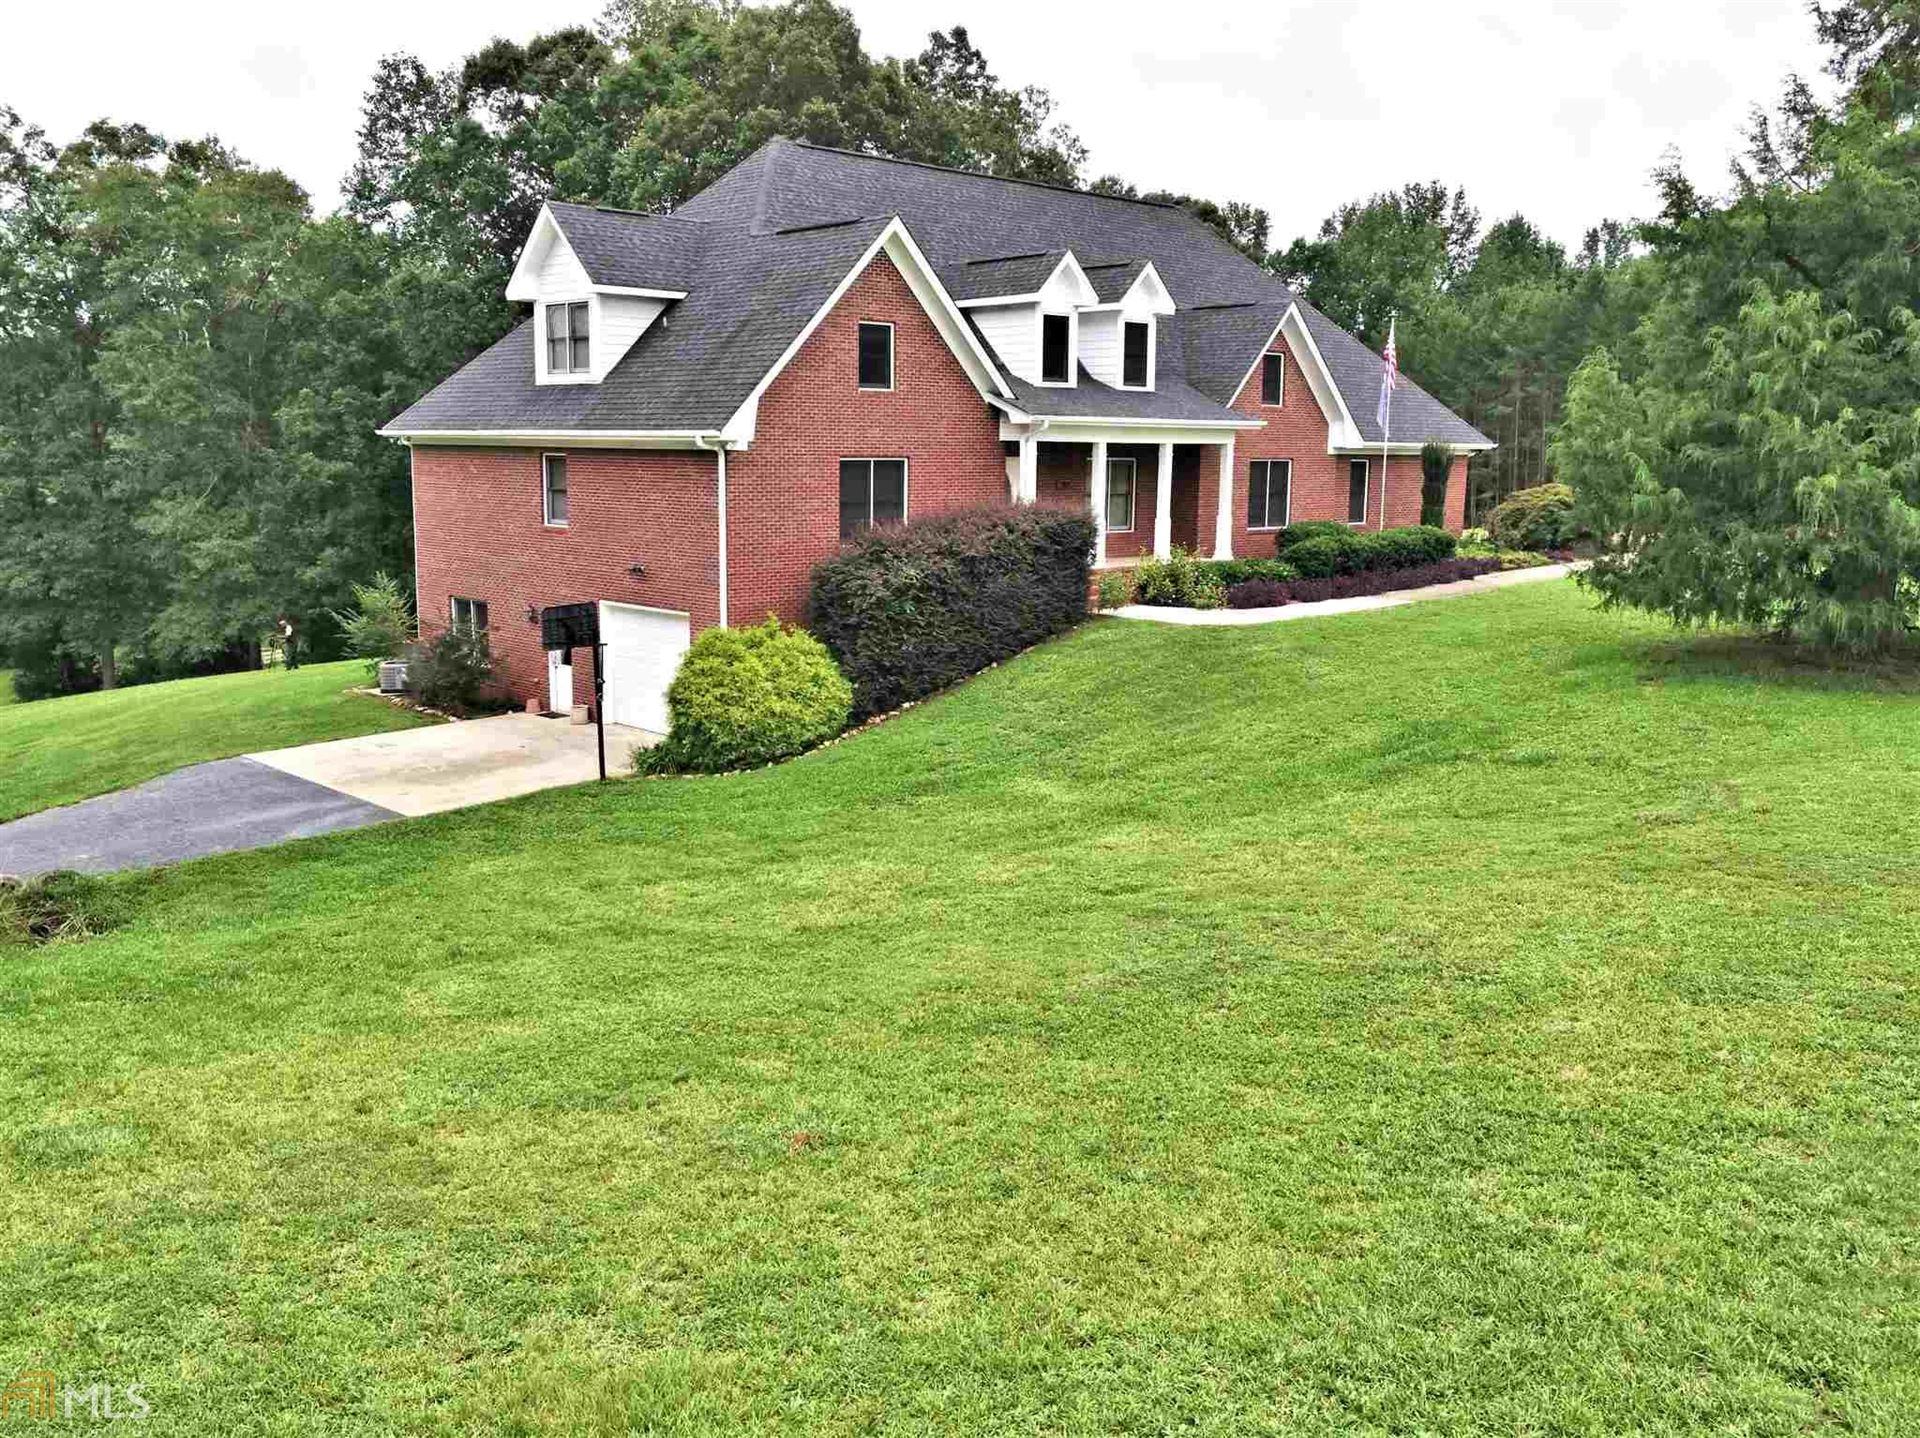 3305 Rogers Rd, McDonough, GA 30252 - MLS#: 8845050